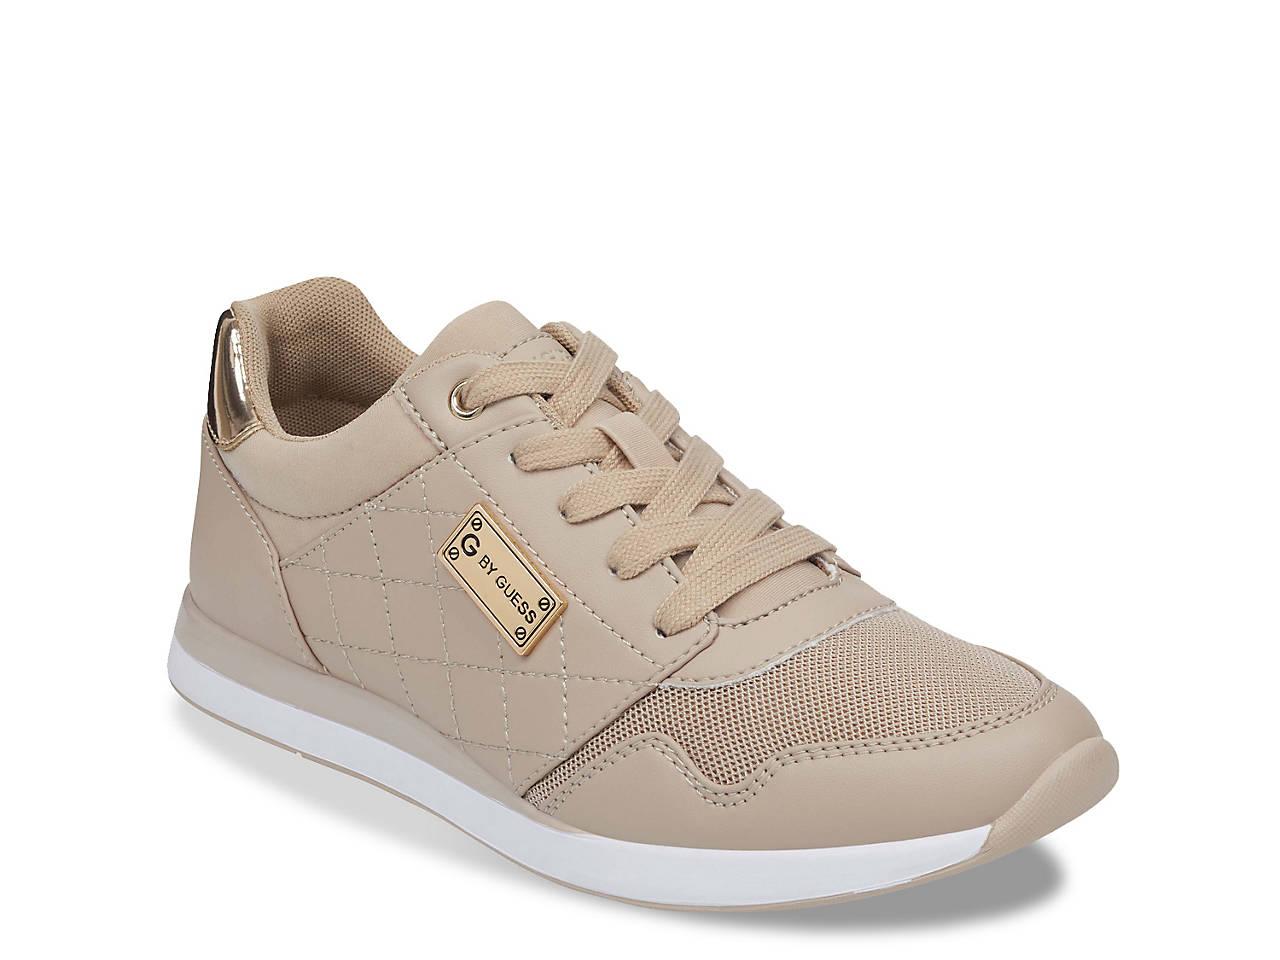 0727e5f8d891 G by GUESS Jeryl Sneaker Women s Shoes